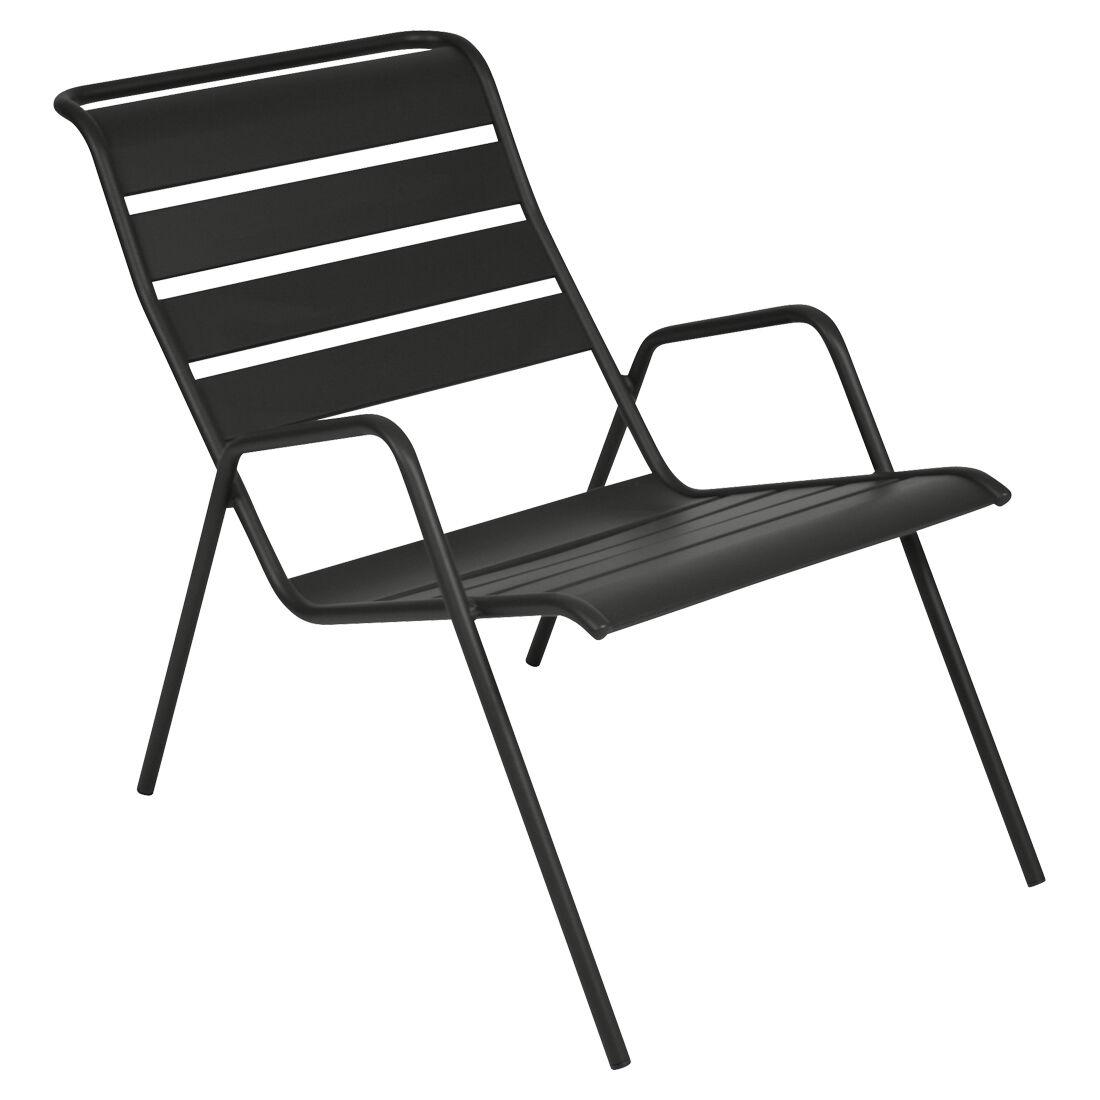 Fermob Monceau Lounge Chair, Liquorice